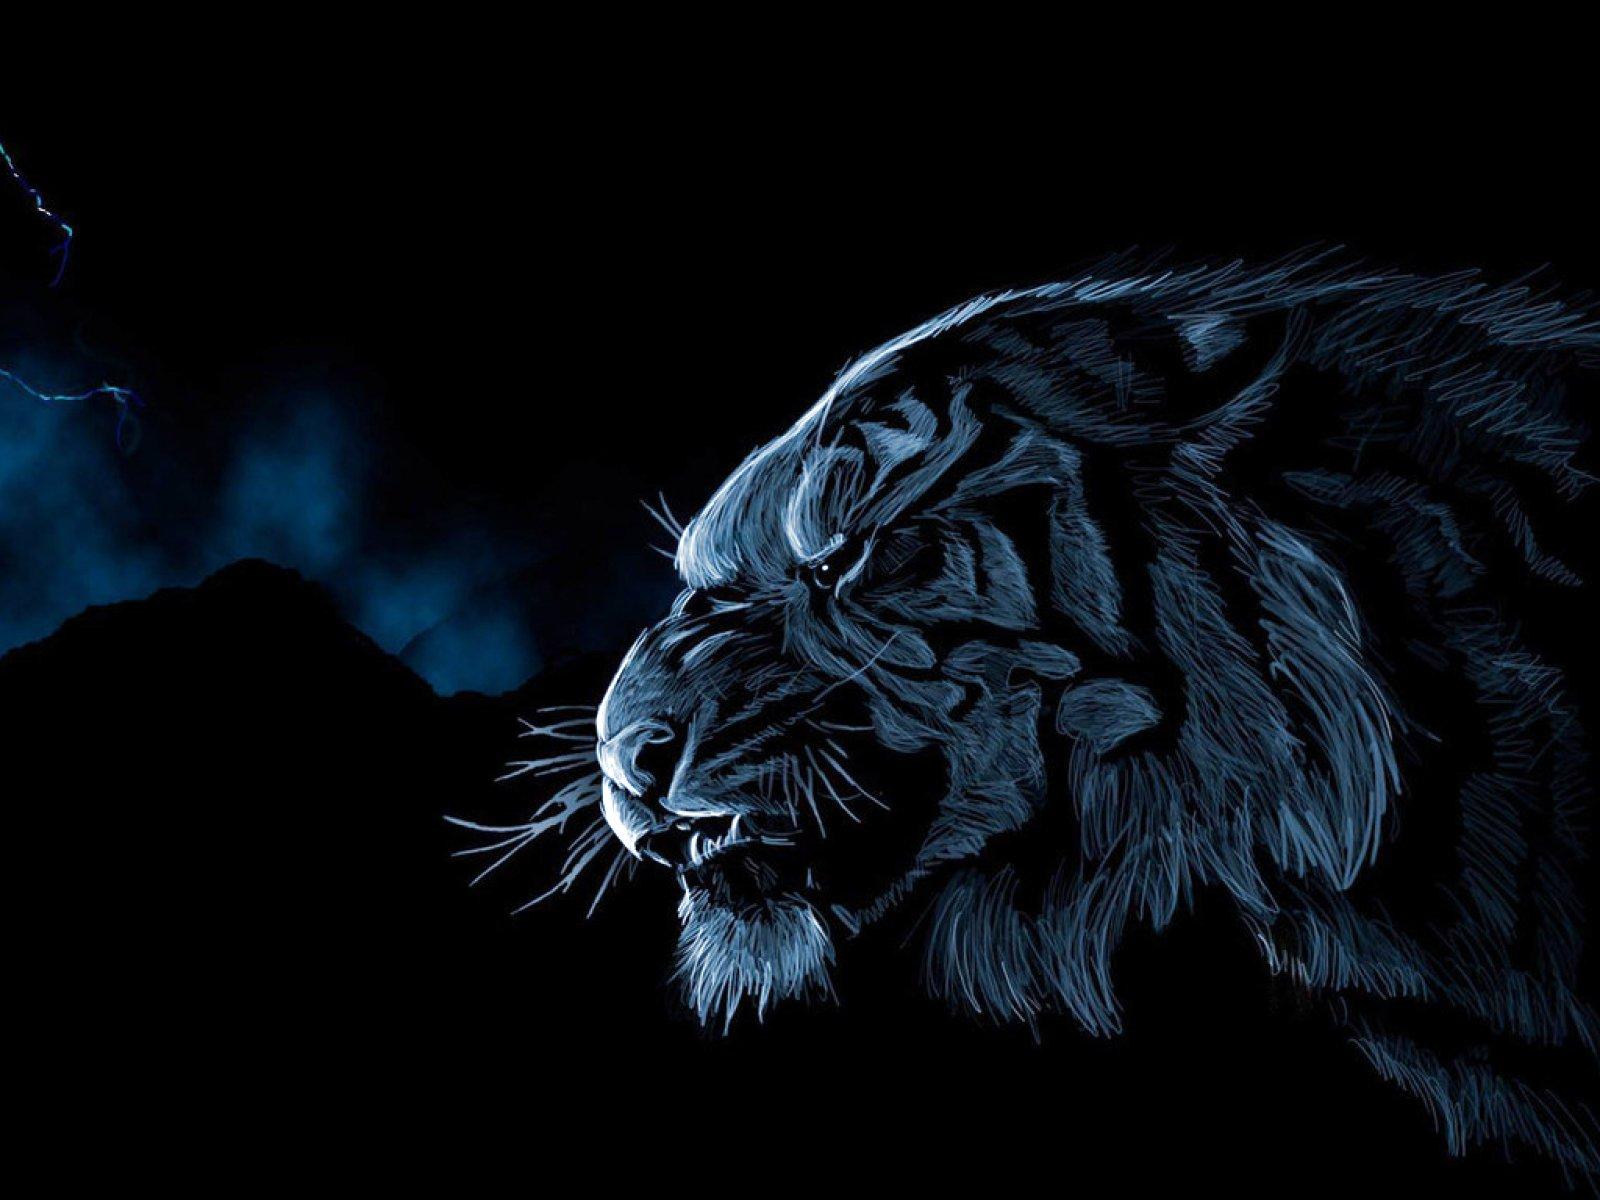 Темные картинки с тигром